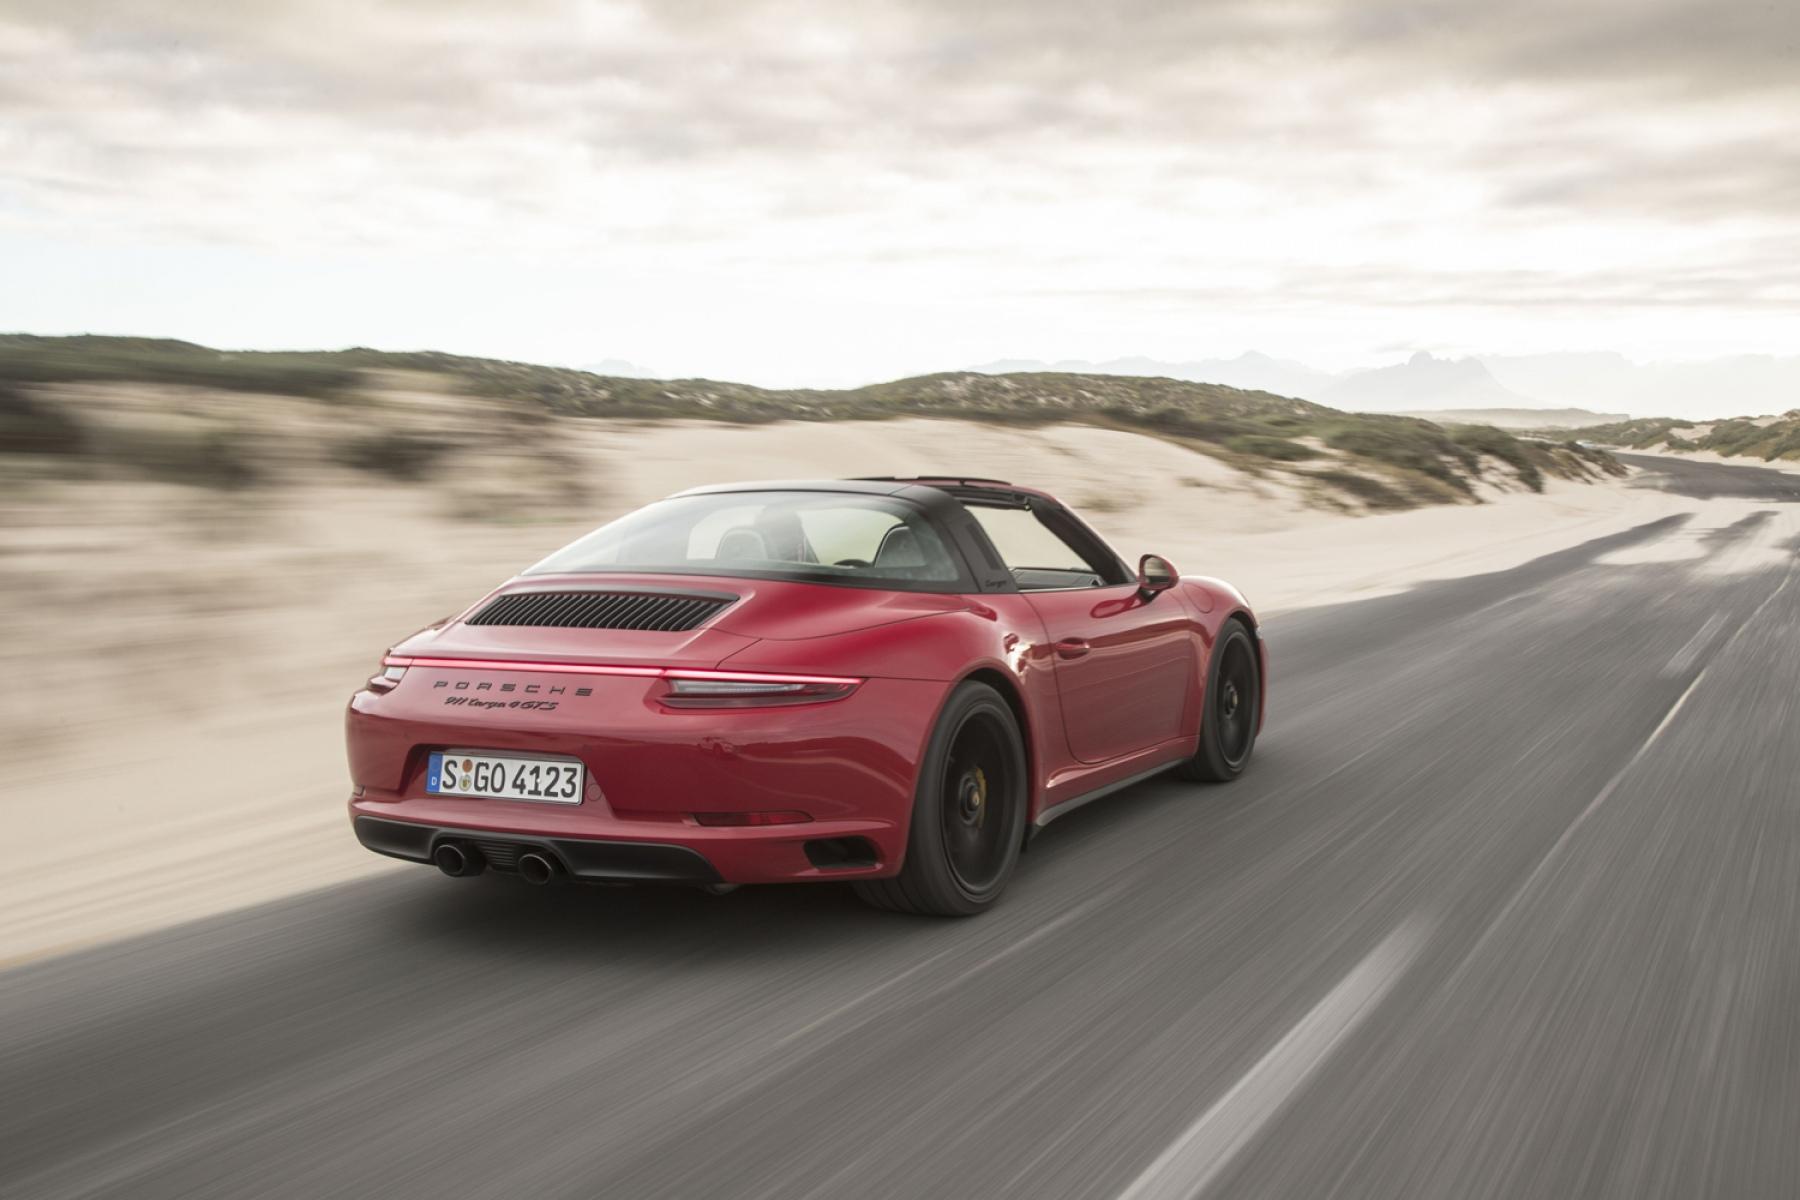 Porsche 911 Targa 4 Gts Carmine Red The New 911 Gts Models